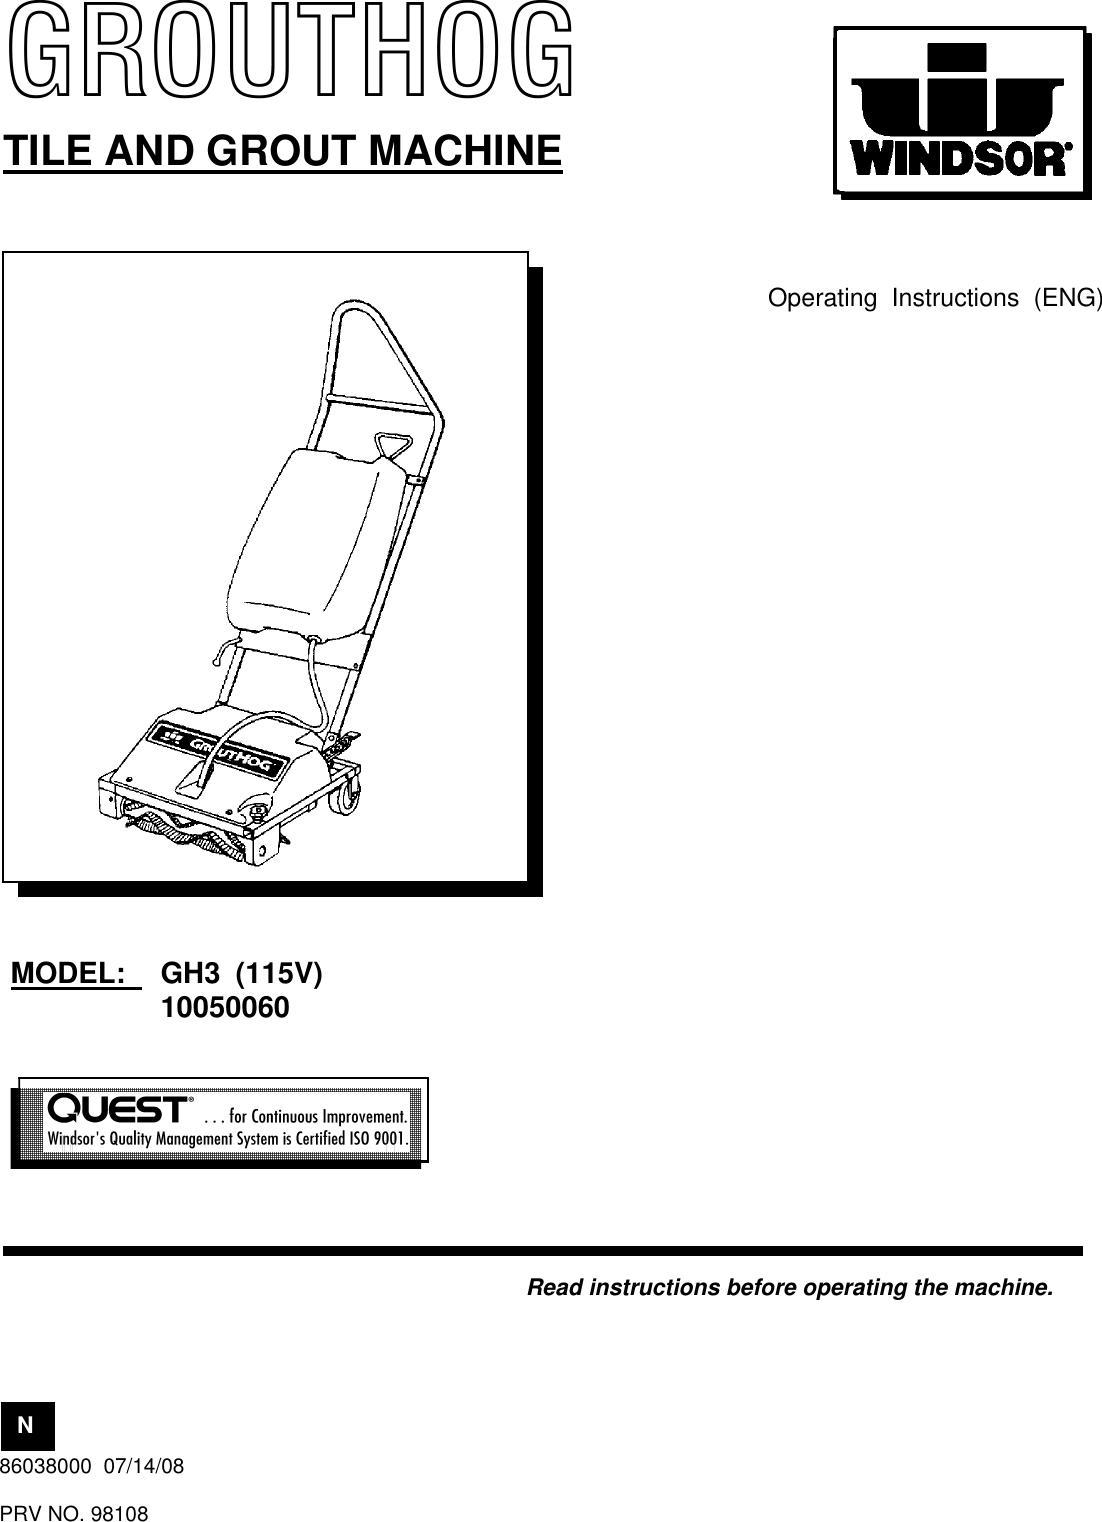 windsor saber compact sc20 user manual Array - windsor grouthog gh3 users  manual 86038000 cvr rh usermanual wiki ...